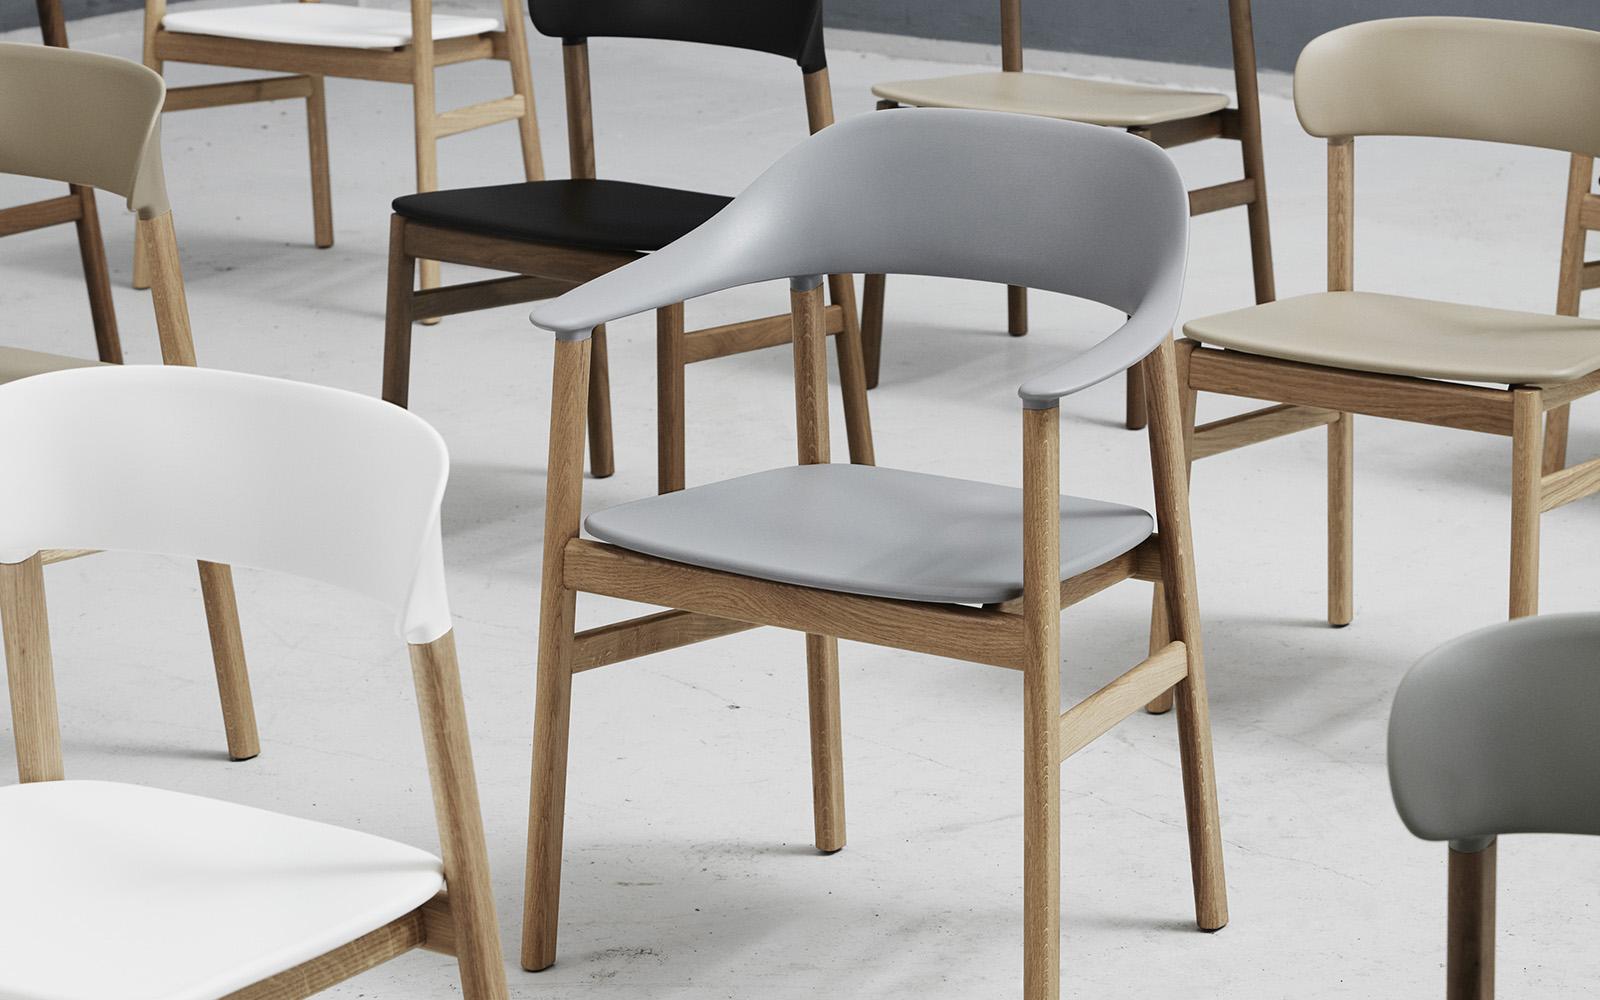 copenhagen dining chairs white wood kitchen herit chair smoked oak dusty green